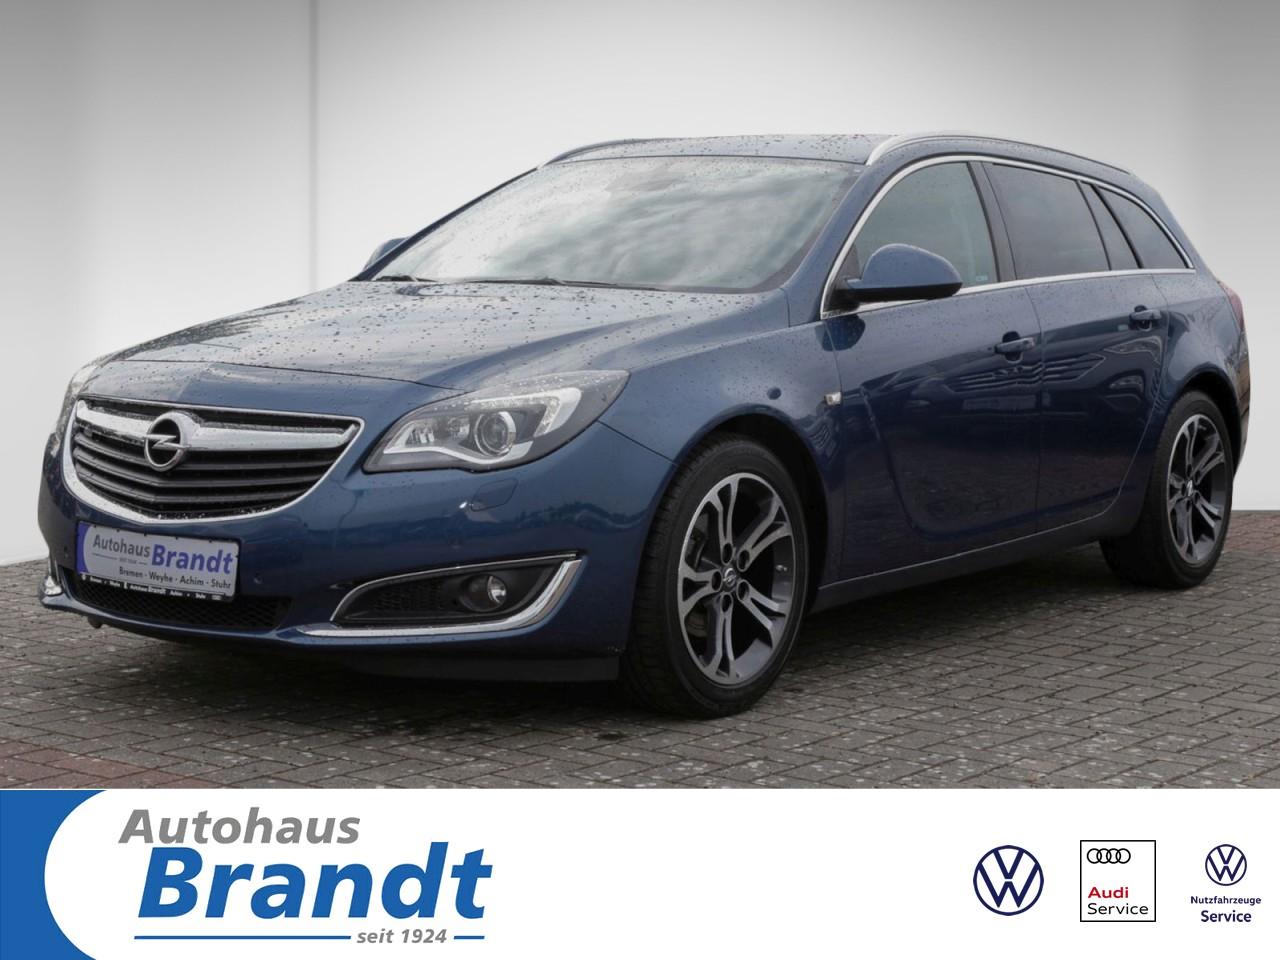 Opel Insignia 1.6 CDTI Innovation XENON*NAVI*GRA, Jahr 2016, Diesel